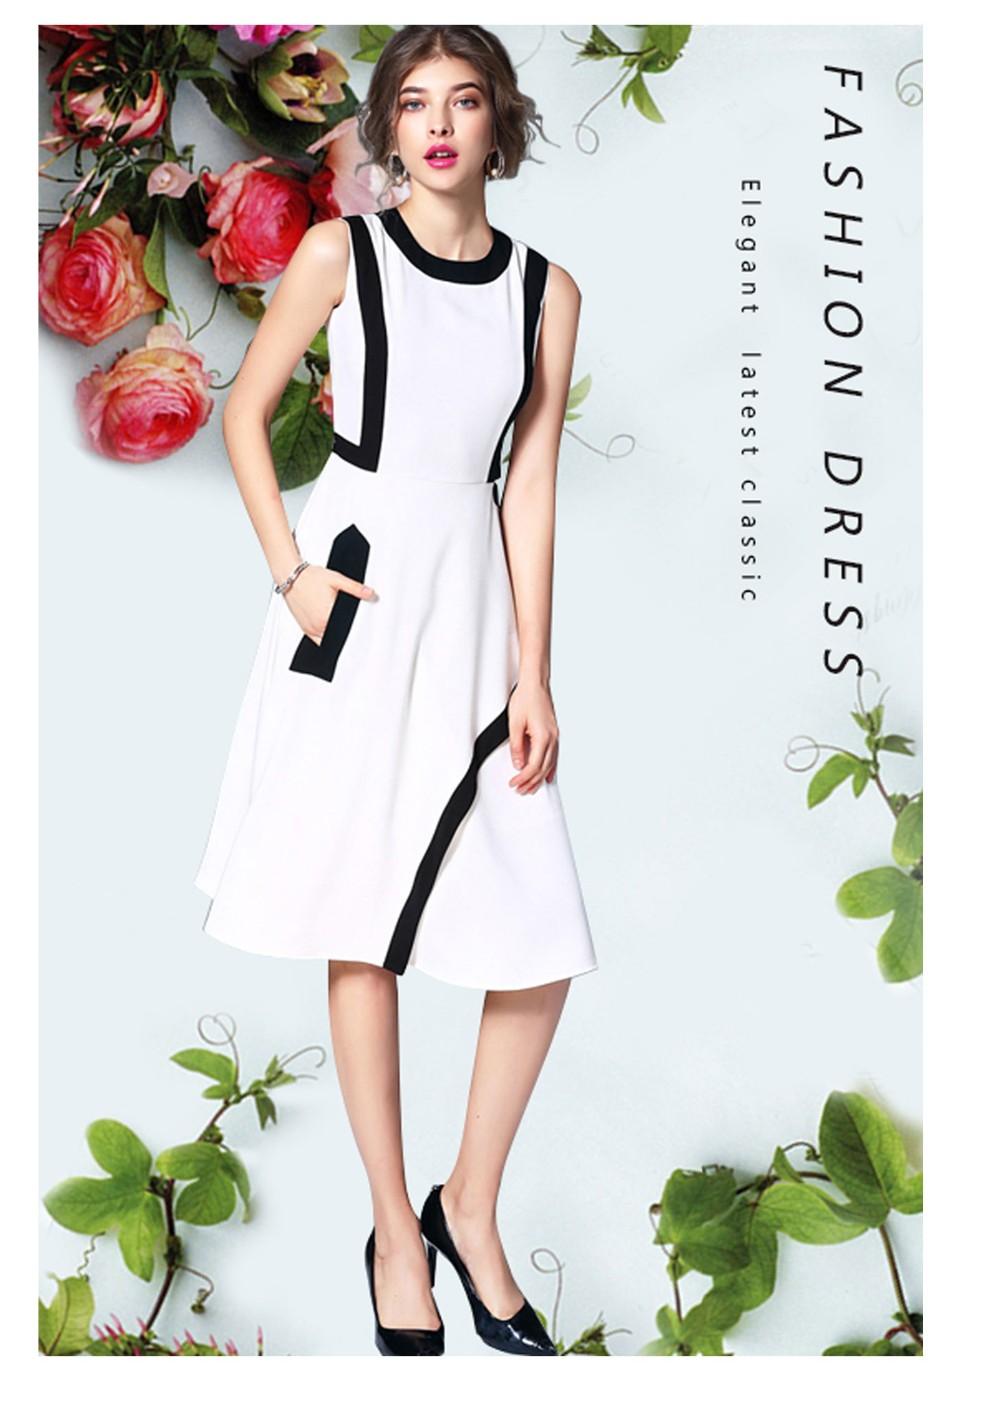 df3e3952db5cc Wholesale Youth Ladies Vintage High Neck Tank Top Girls Casual Clothing  Ladies White Design Vest Slim